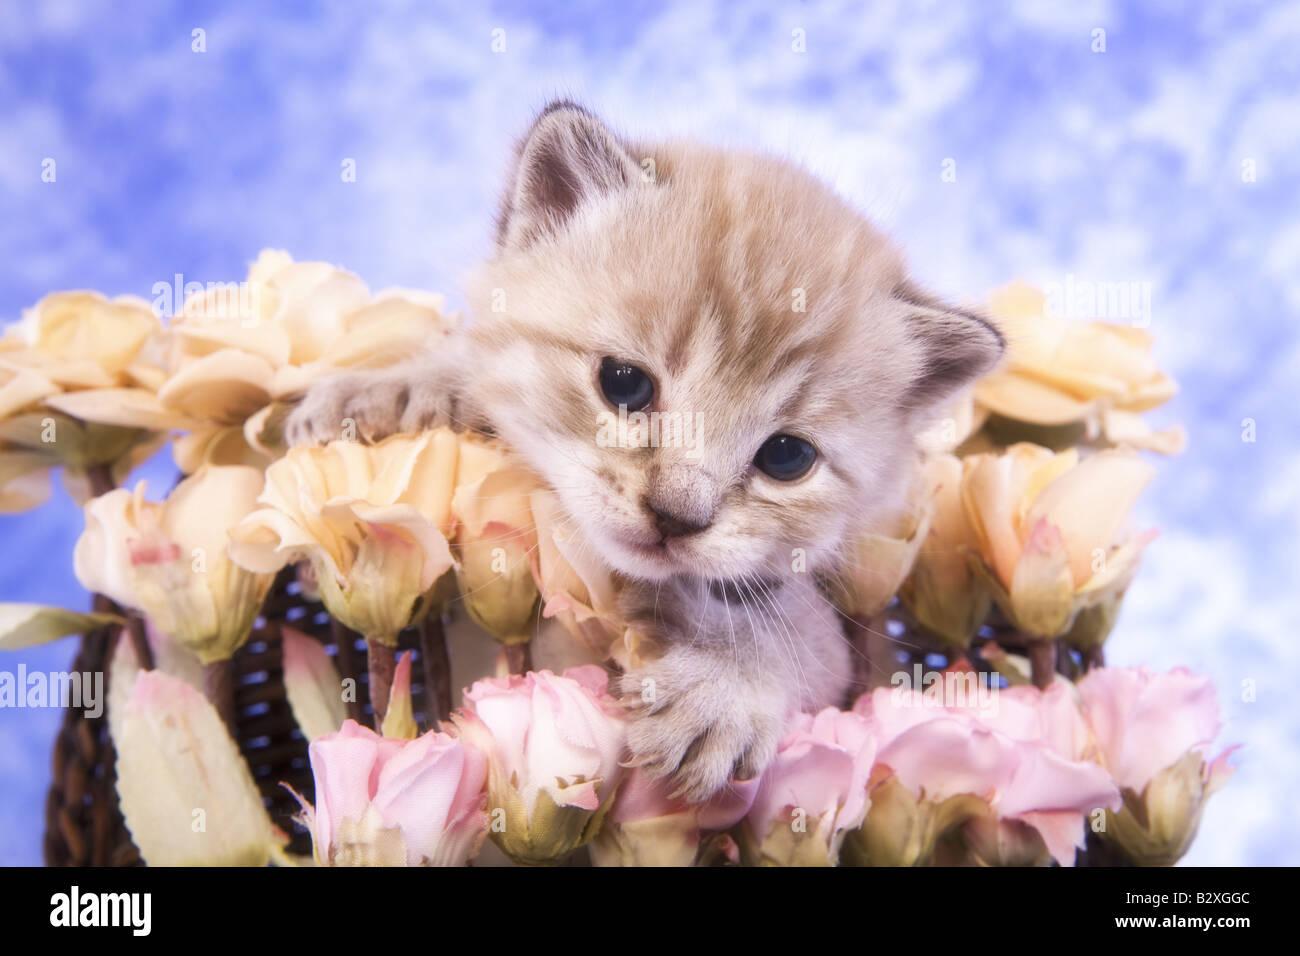 Cute kitten in bouquet of pink flowers on blue background Stock ...